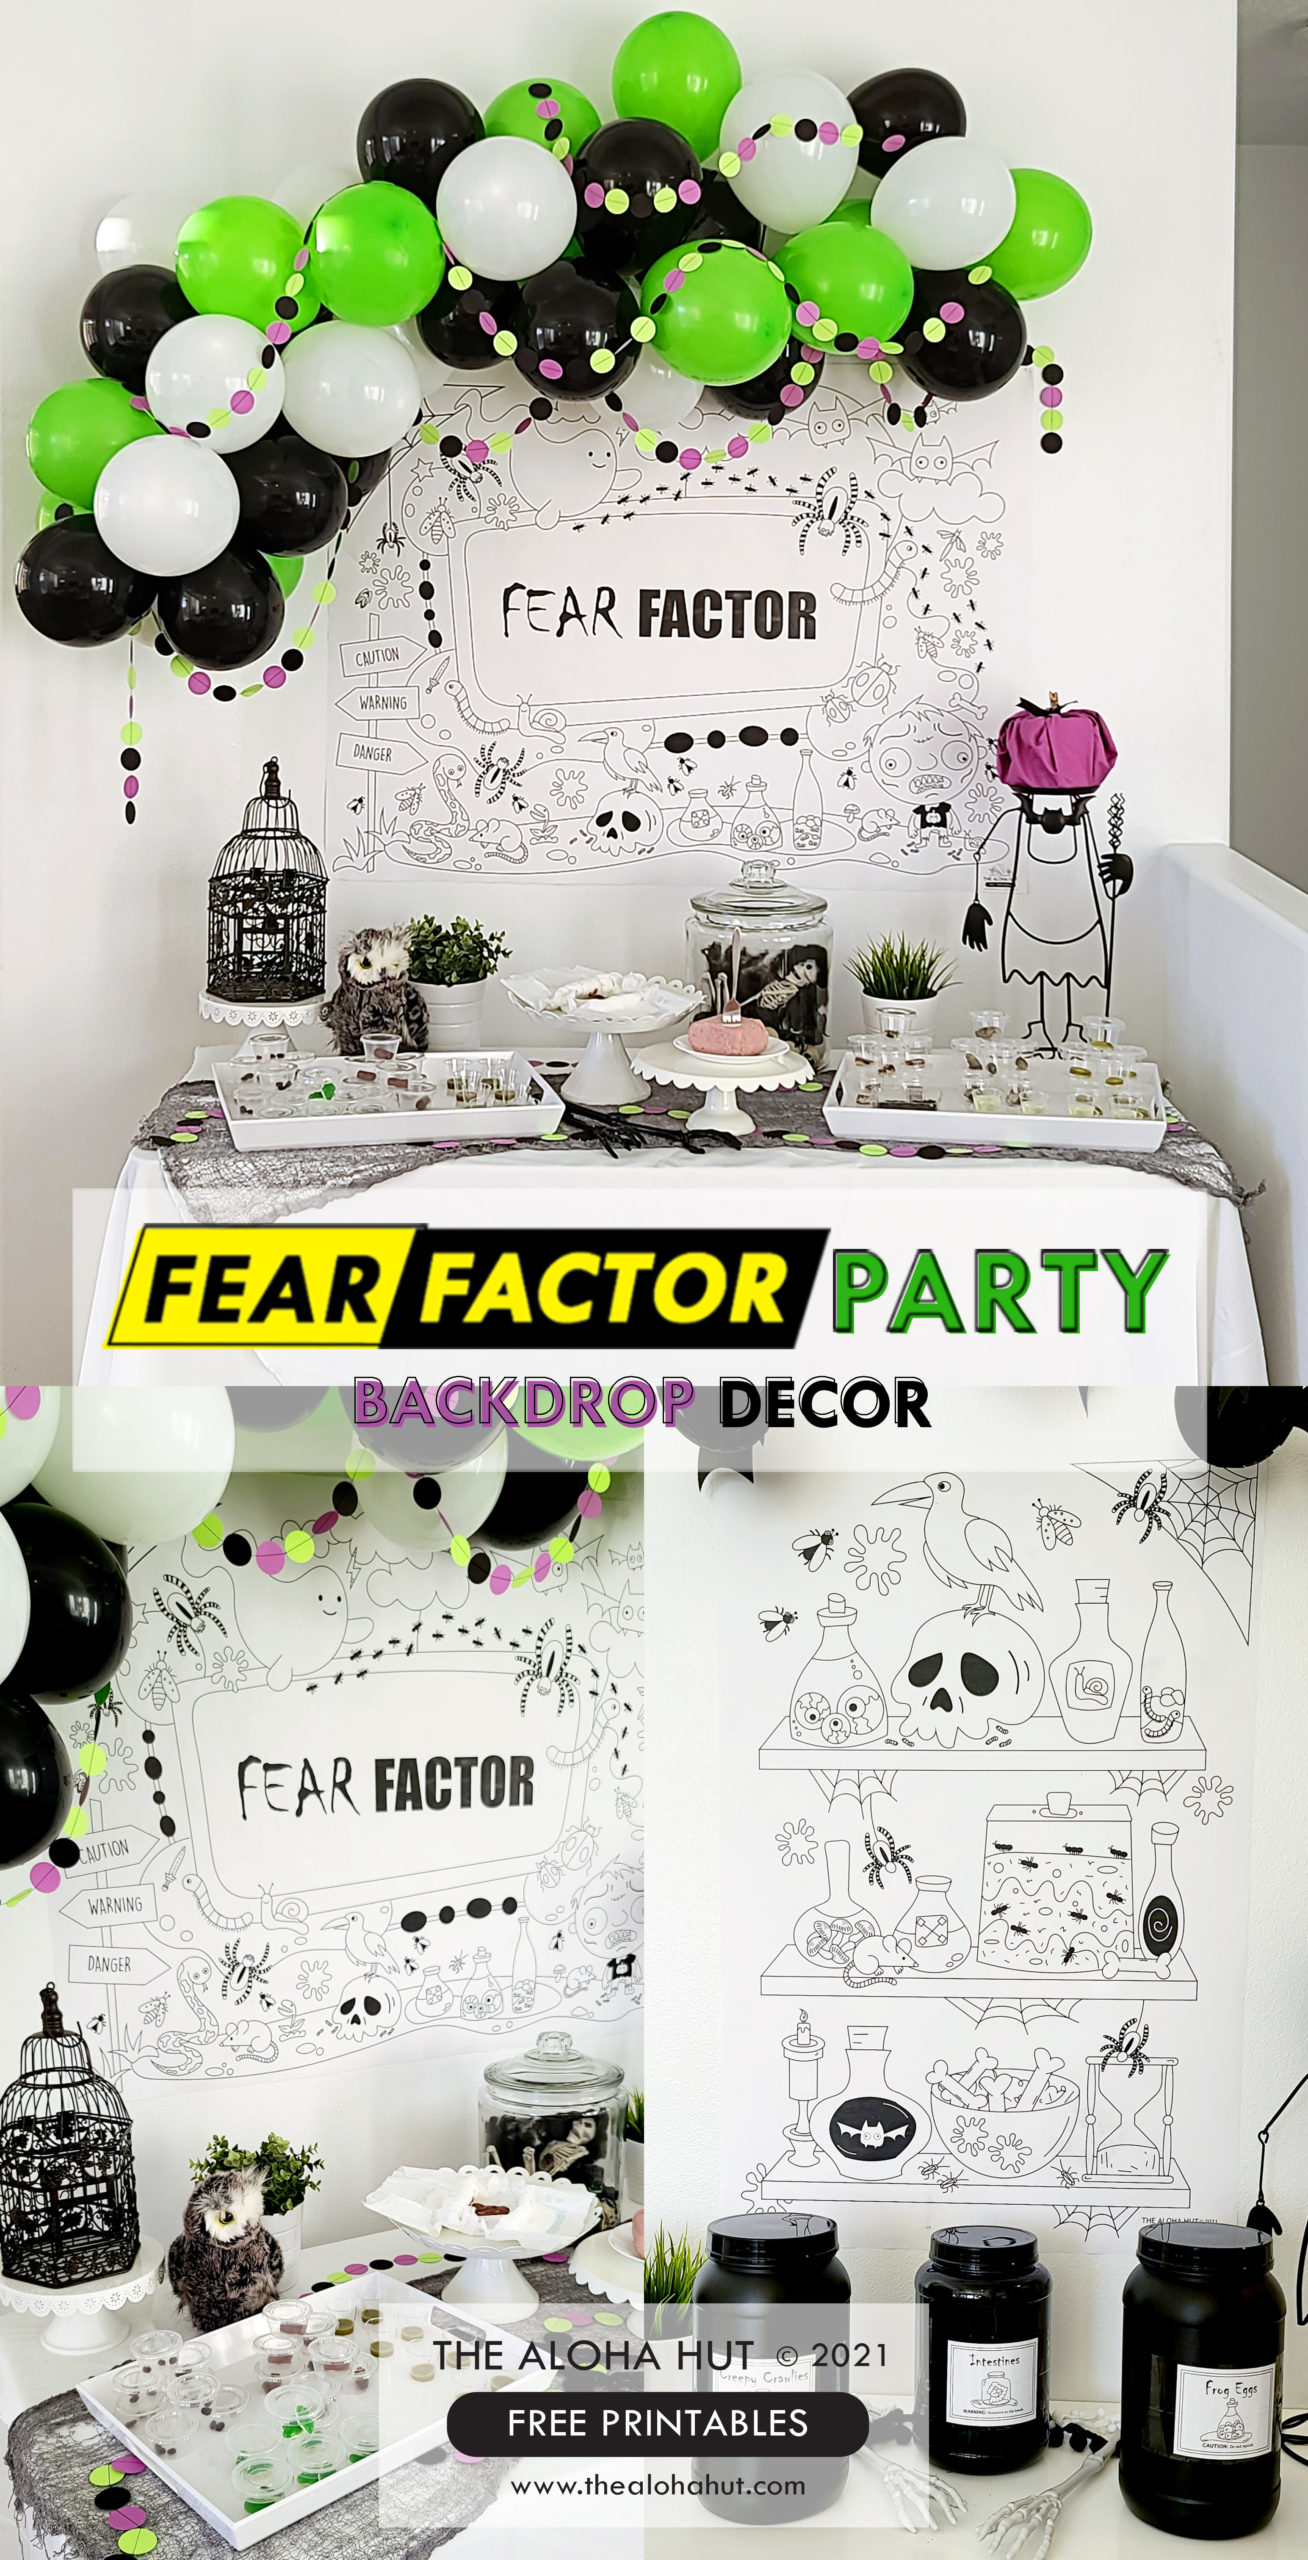 Fear Factor Party Backdrop Decor - The Aloha Hut